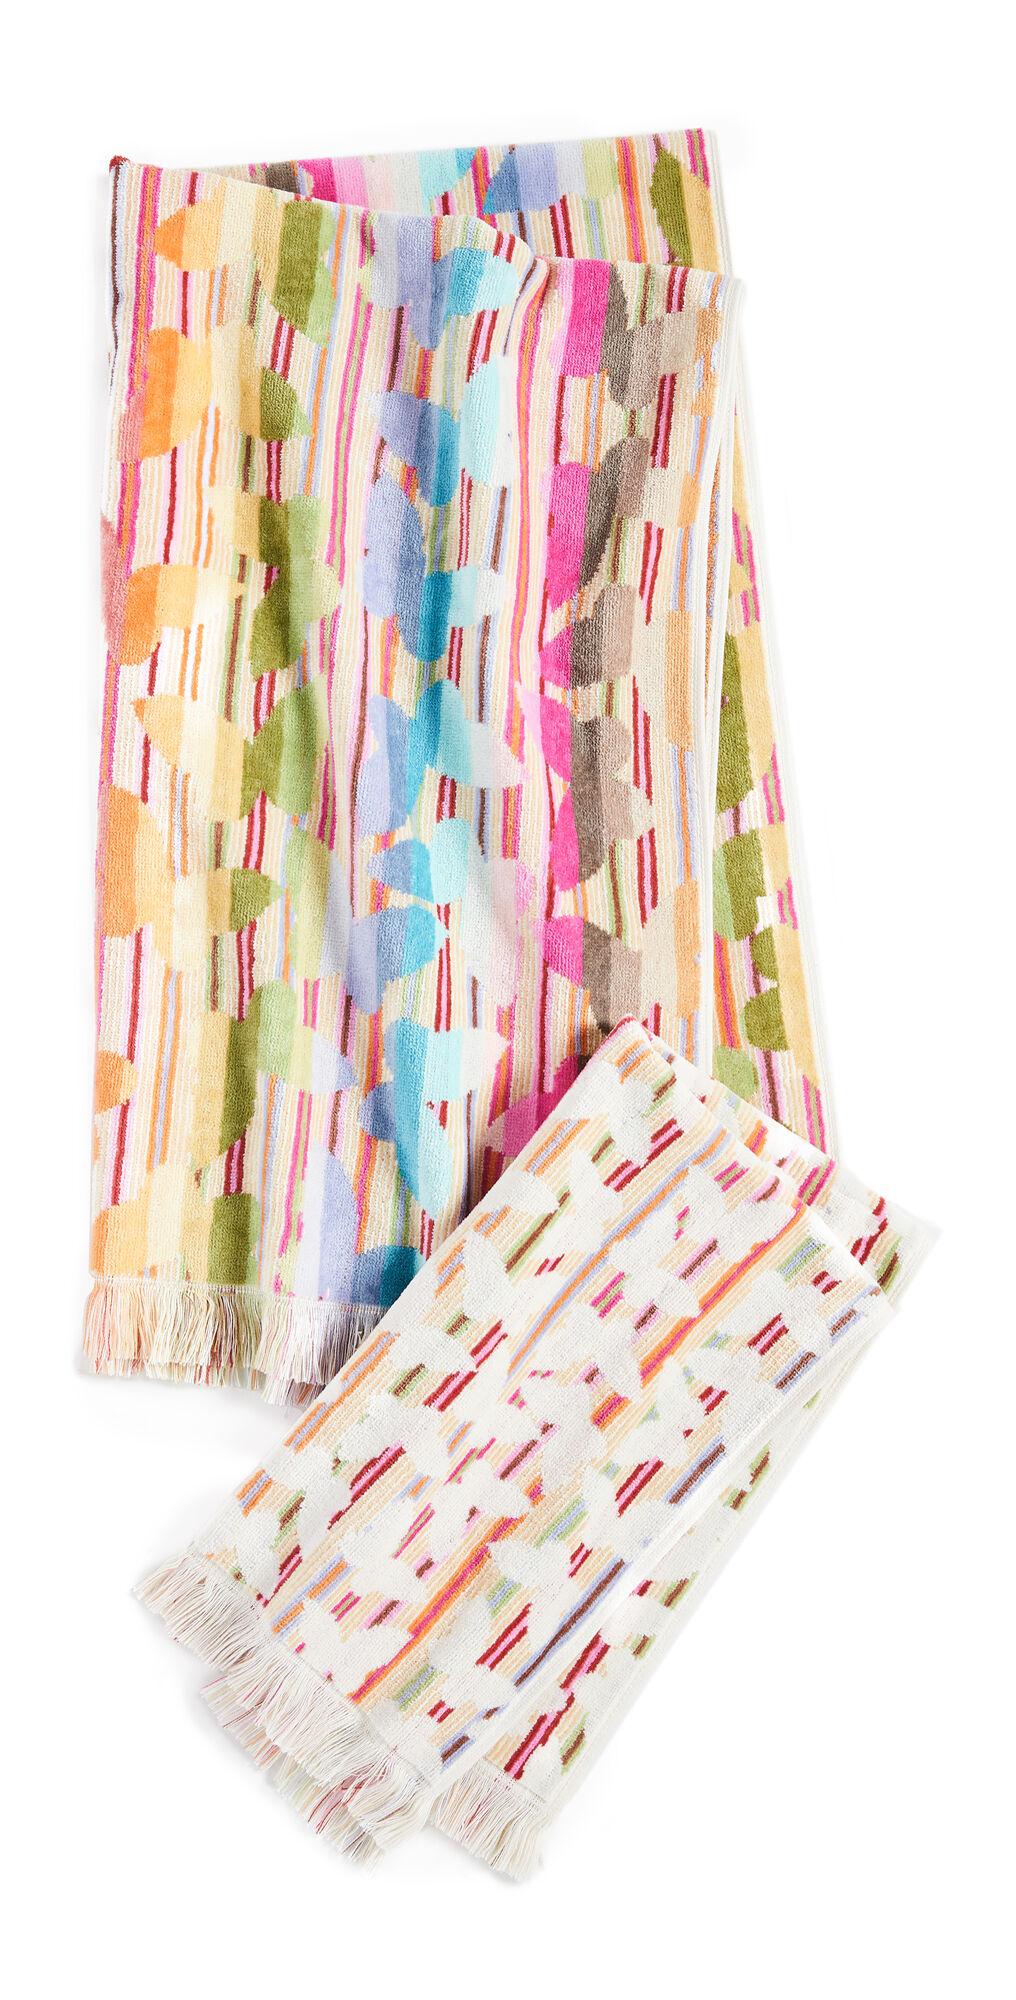 Missoni Home Josephine 2 Piece Towel Set  - Multi Pink - Size: One Size